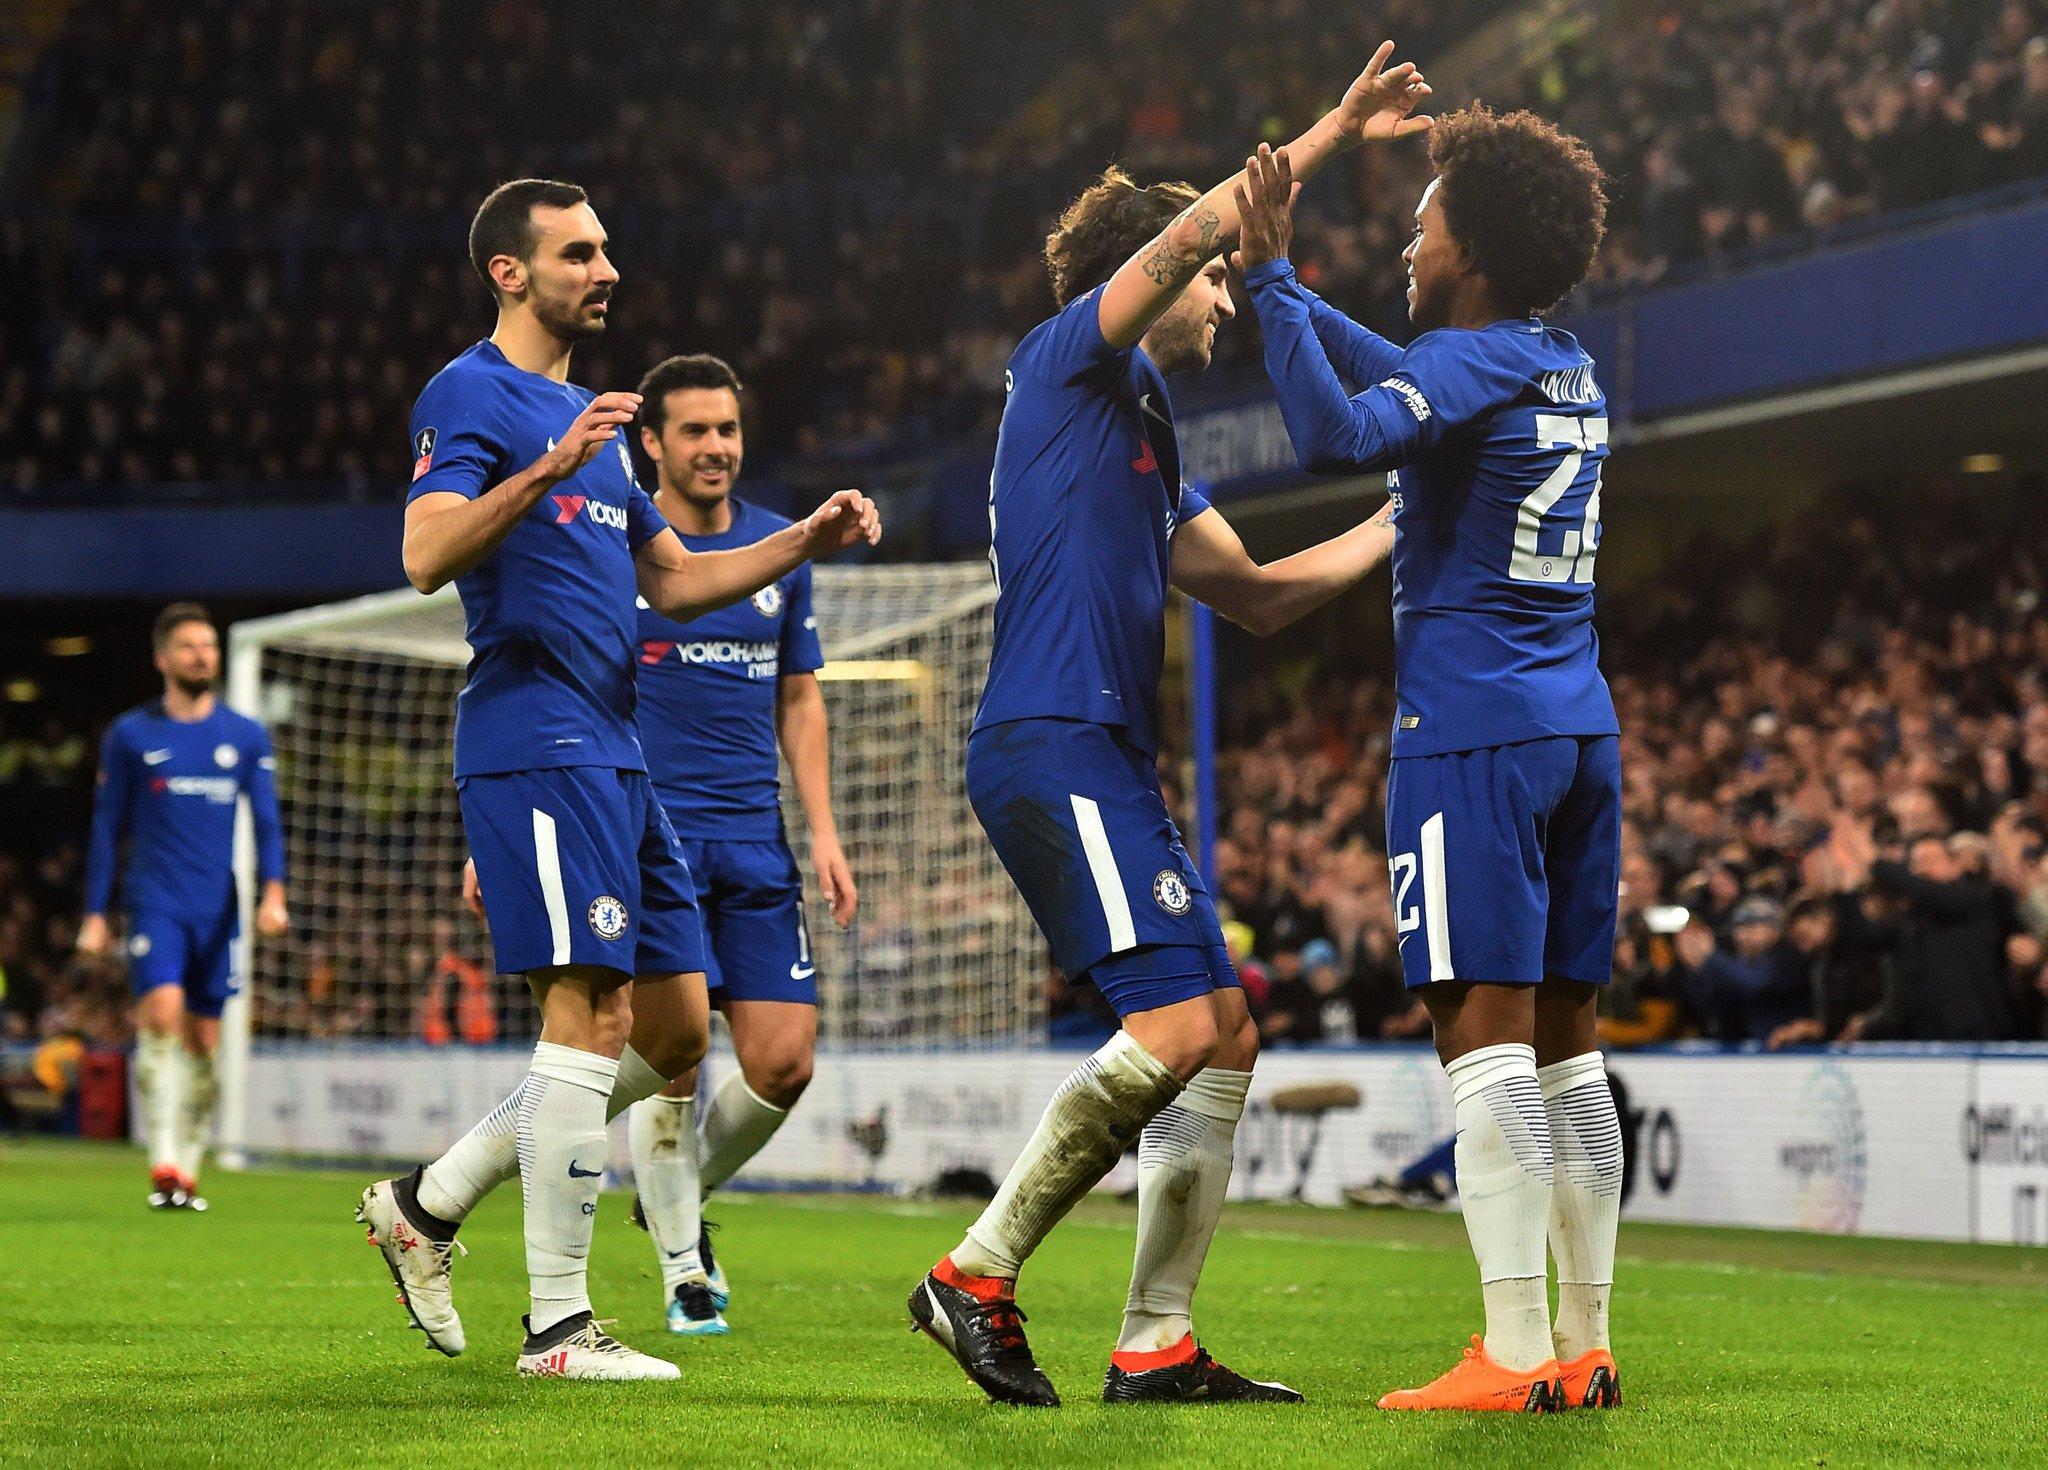 Chelsea vs Hull City 0-4 Highlights & Goals Video